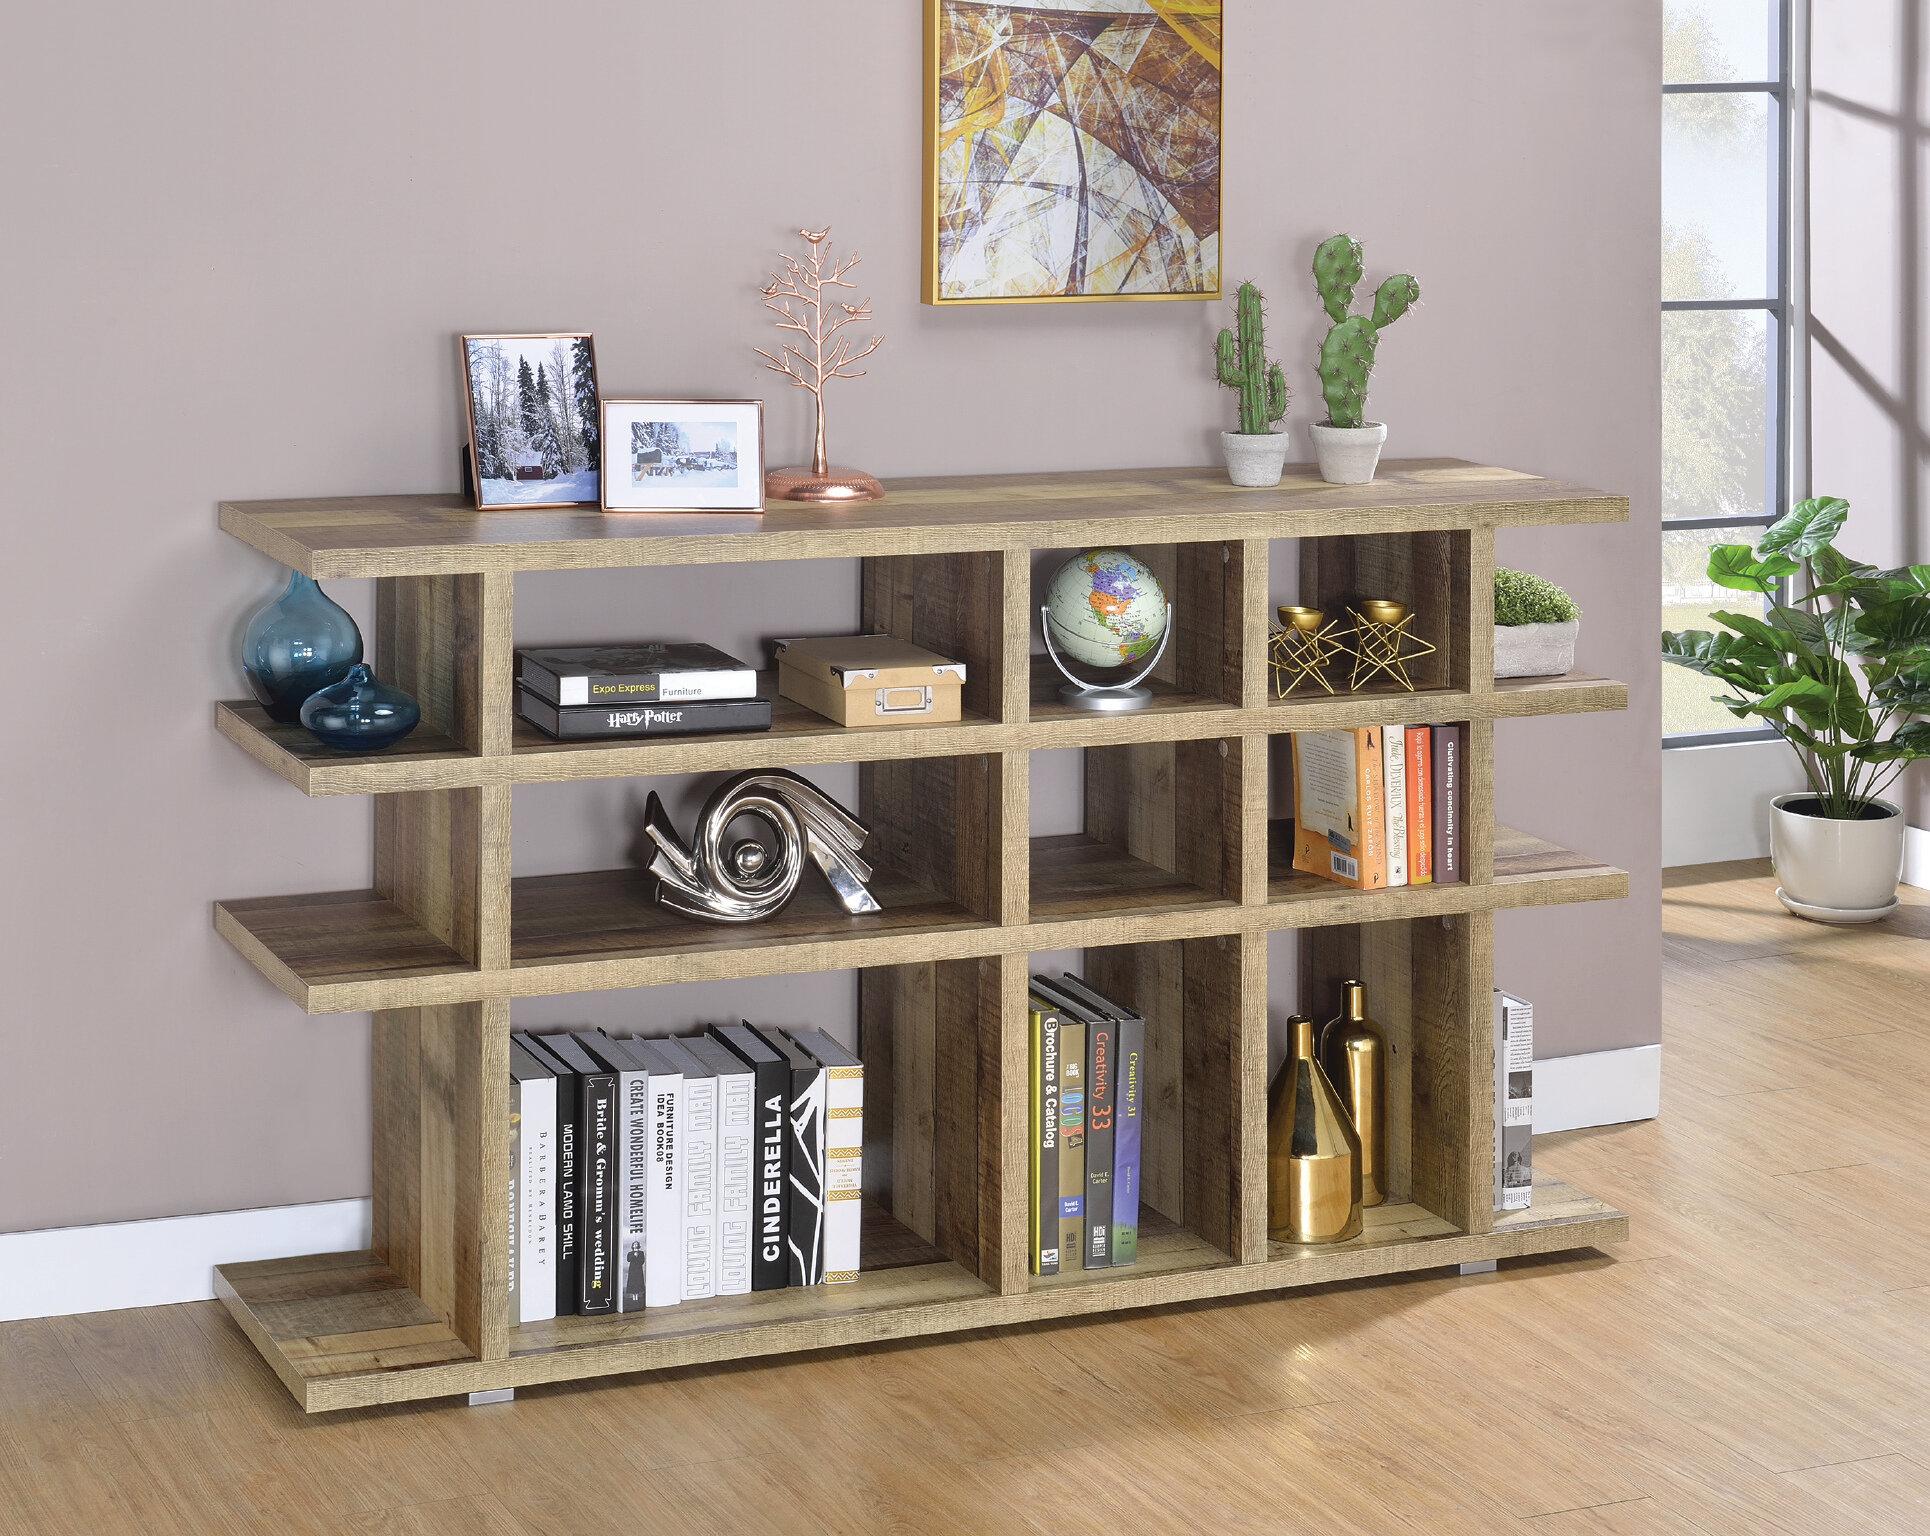 Dalenna Bookcase